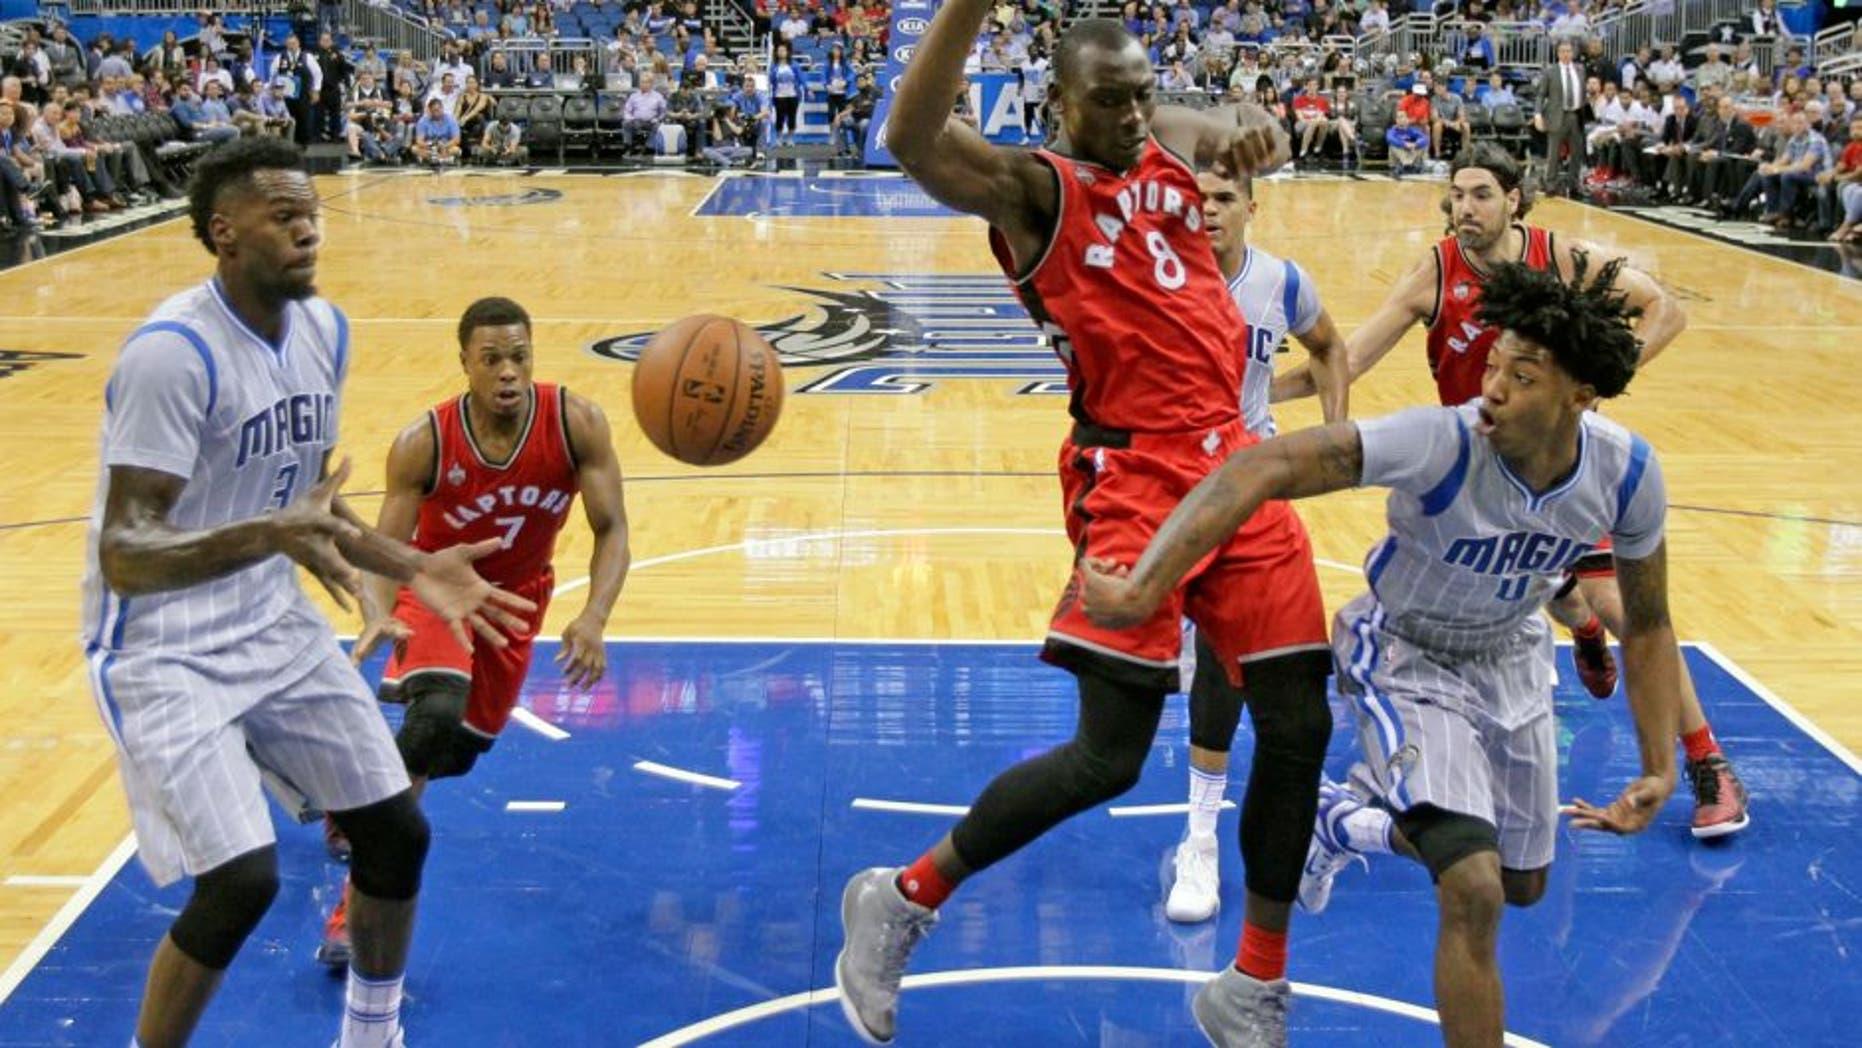 Orlando Magic guard Elfrid Payton (4) passes the ball around Toronto Raptors forward Bismack Biyombo (8) to center Dewayne Dedmon, left, during the first half of an NBA basketball game, Friday, Nov. 6, 2015, in Orlando, Fla. (AP Photo/John Raoux)